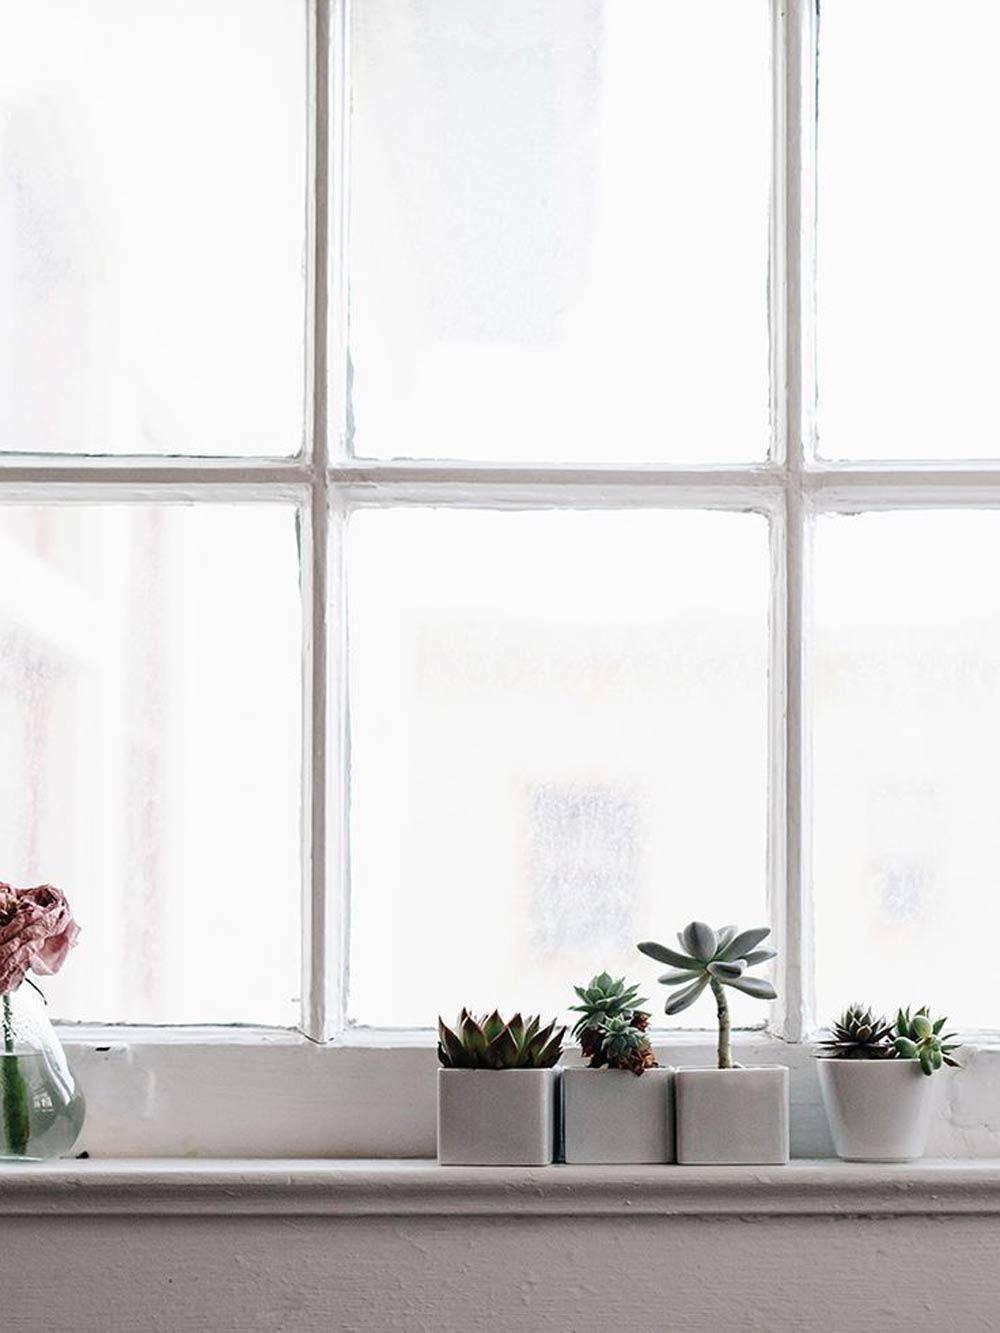 Oracle, Fox, Sunday, Sanctuary, White, Interiors, Exteriors, White, Wanderlust, Cactus, Windowsill